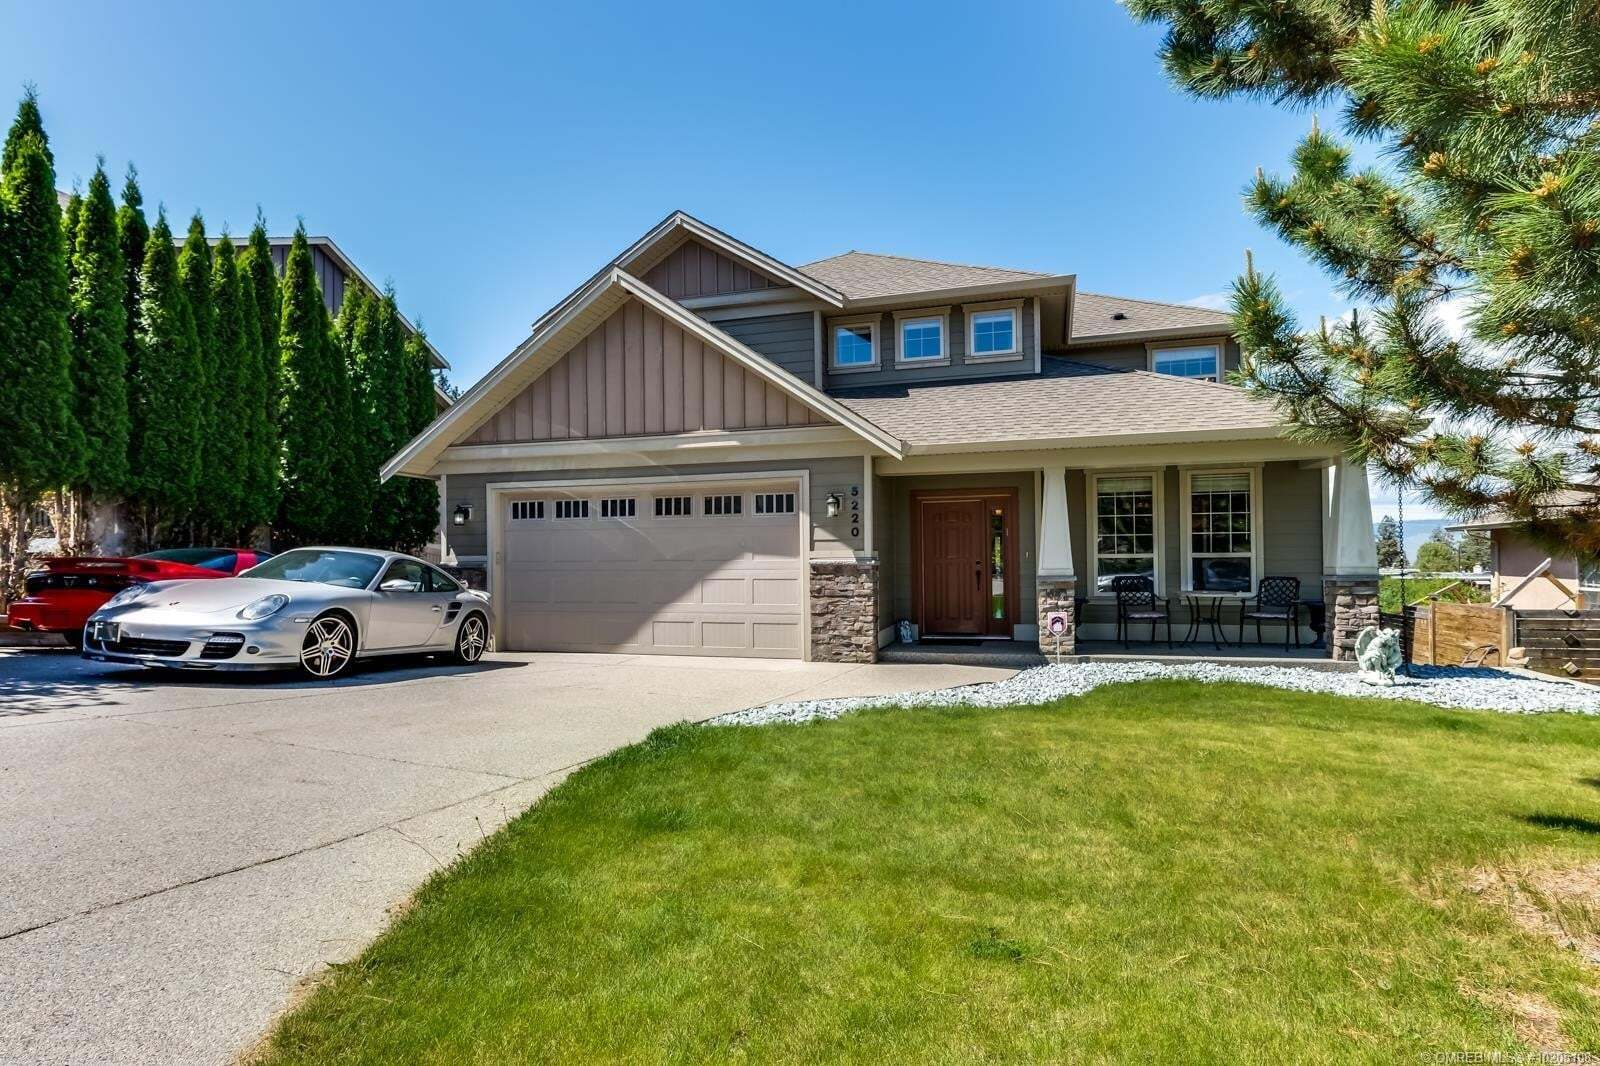 House for sale at 5220 Cobble Cres Kelowna British Columbia - MLS: 10205108